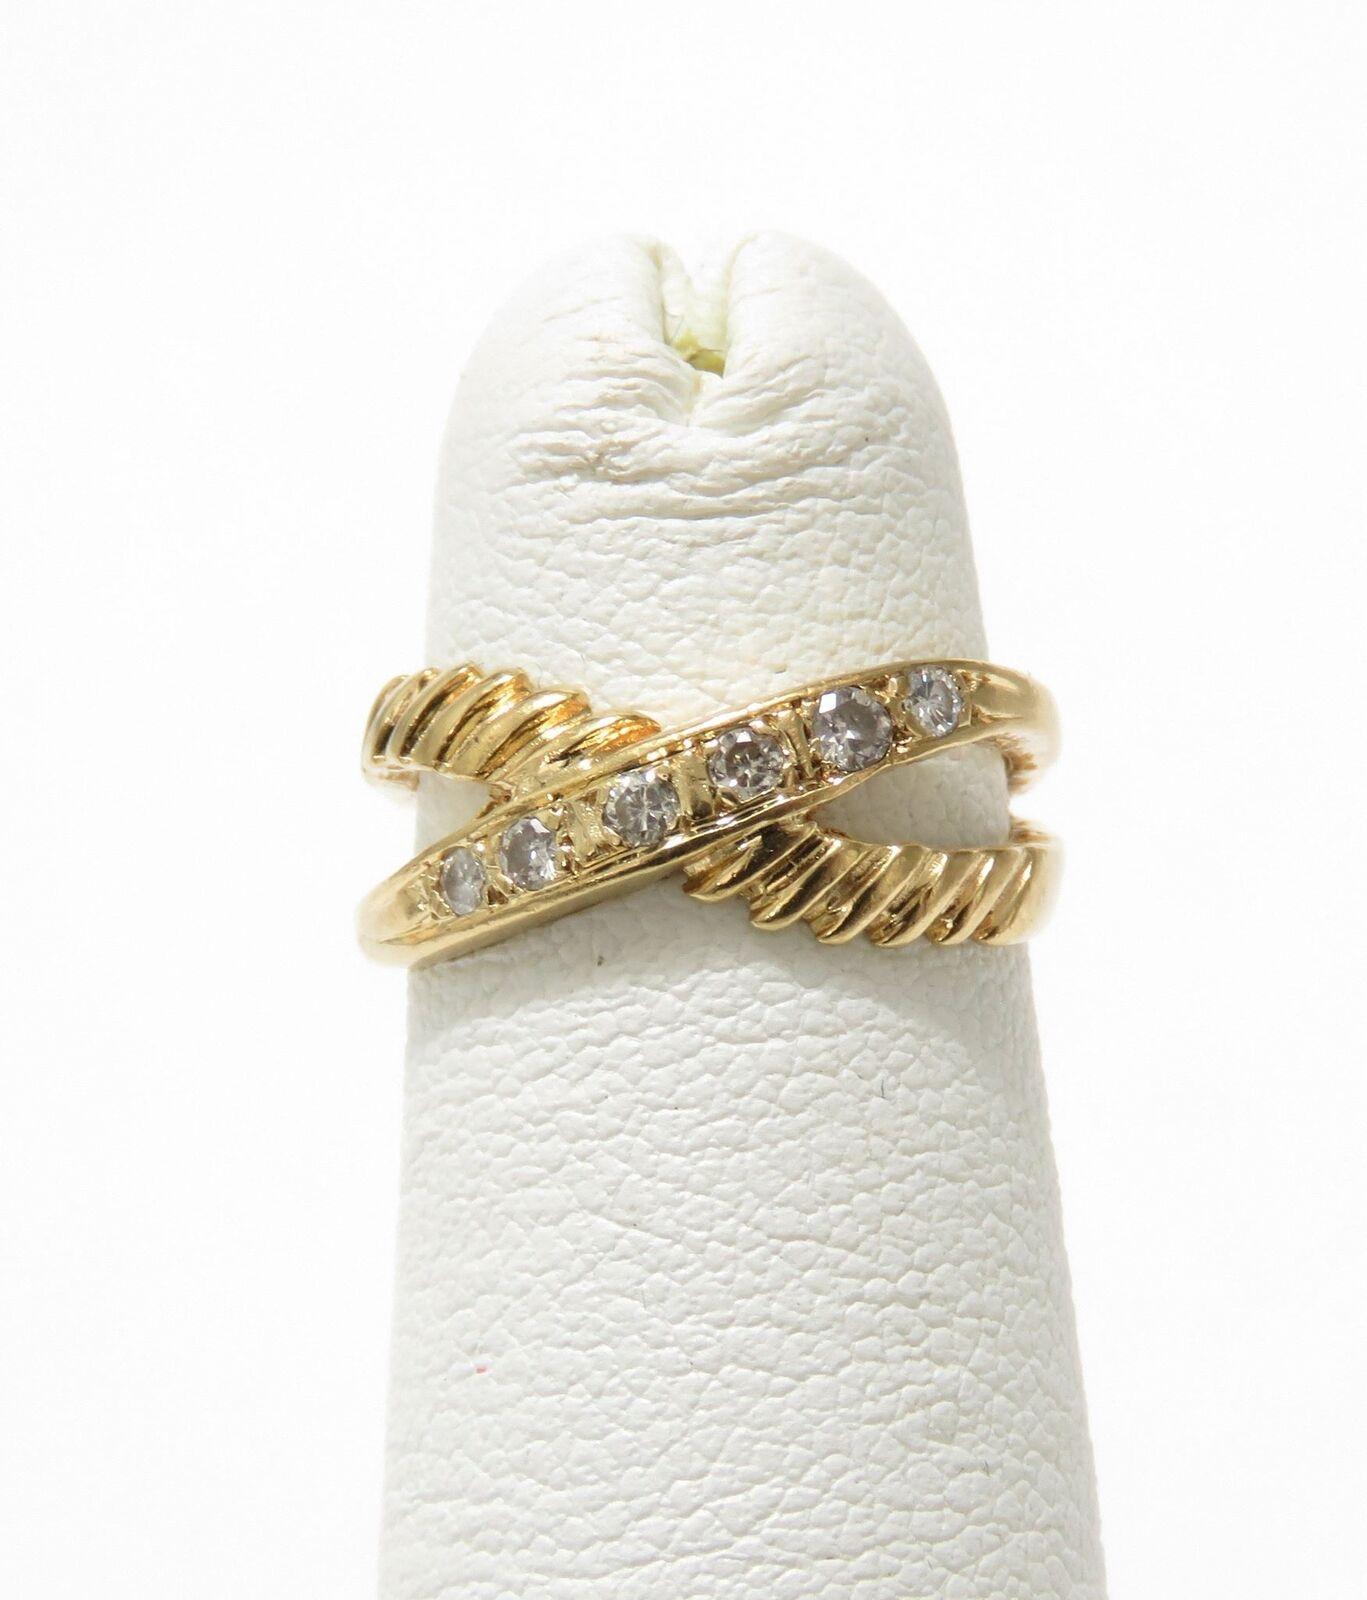 14k Yellow gold Diamond Ring Size 1.75